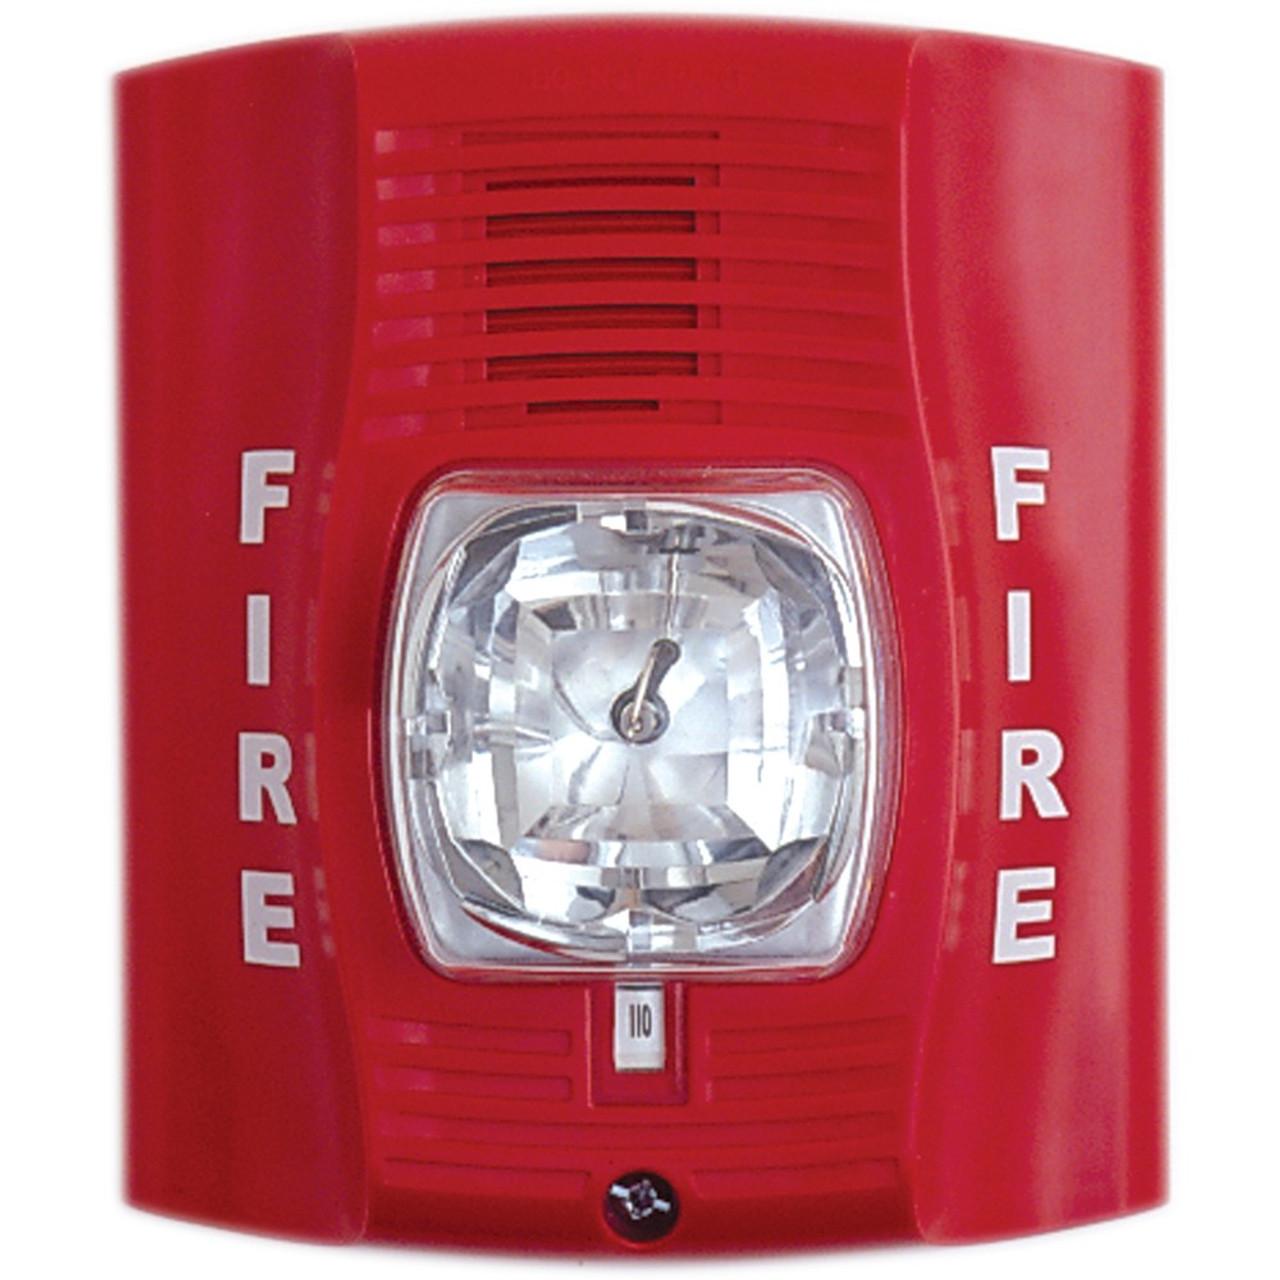 Fire Alarm Strobe Hidden Camera W 4g Cellular Remote